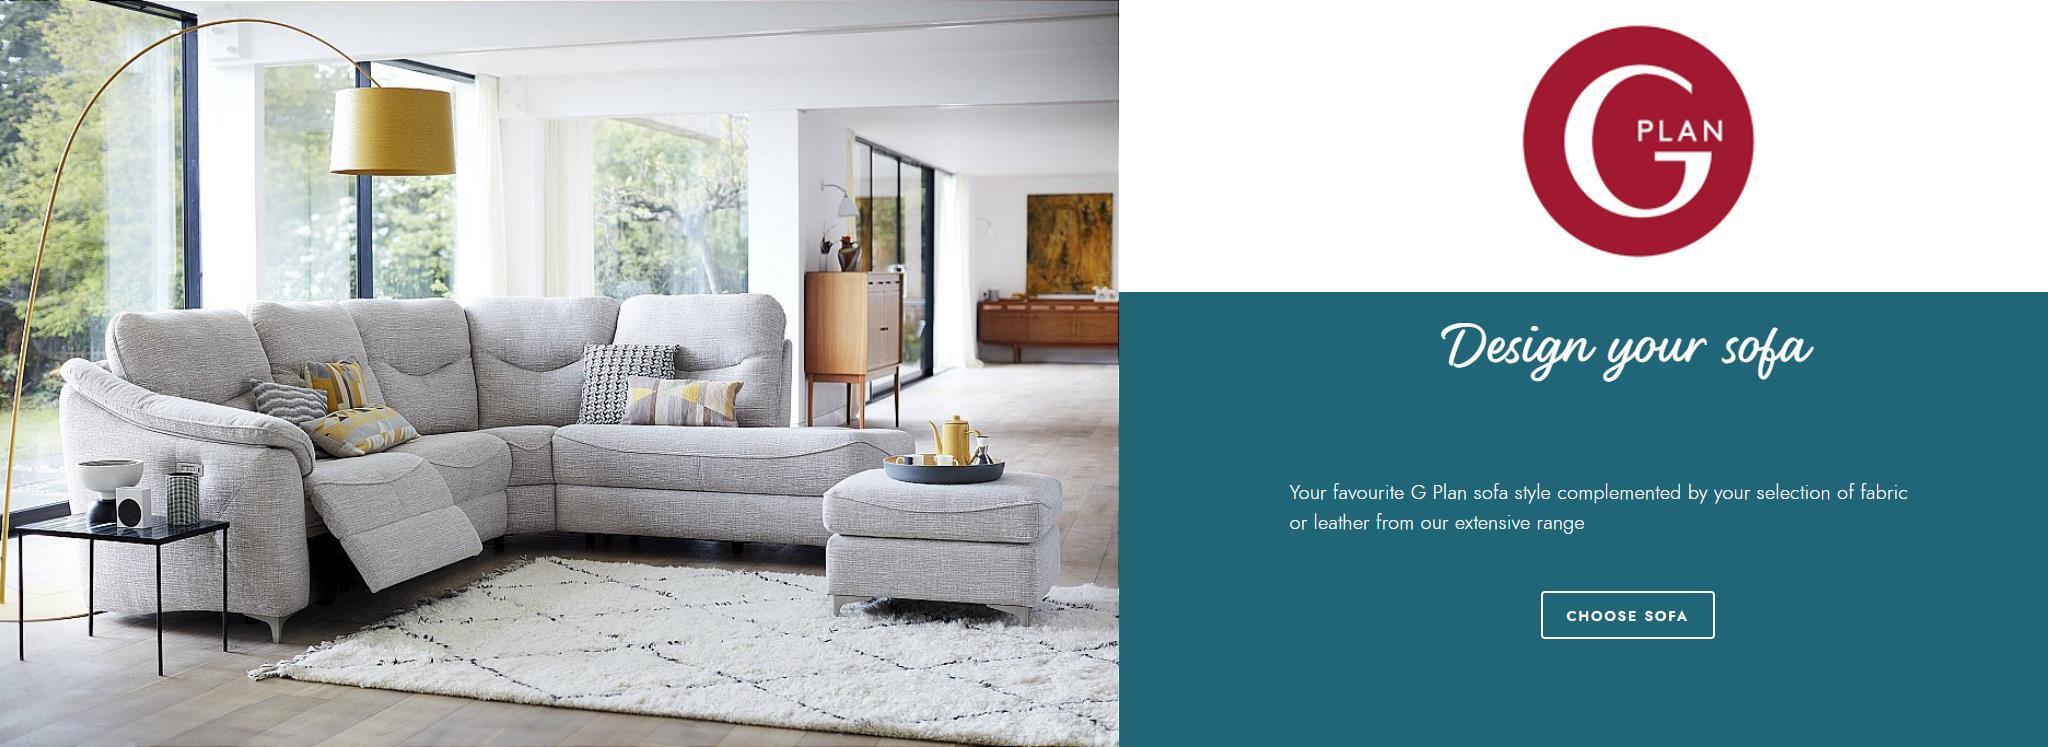 G Plan Upholstery Sofas